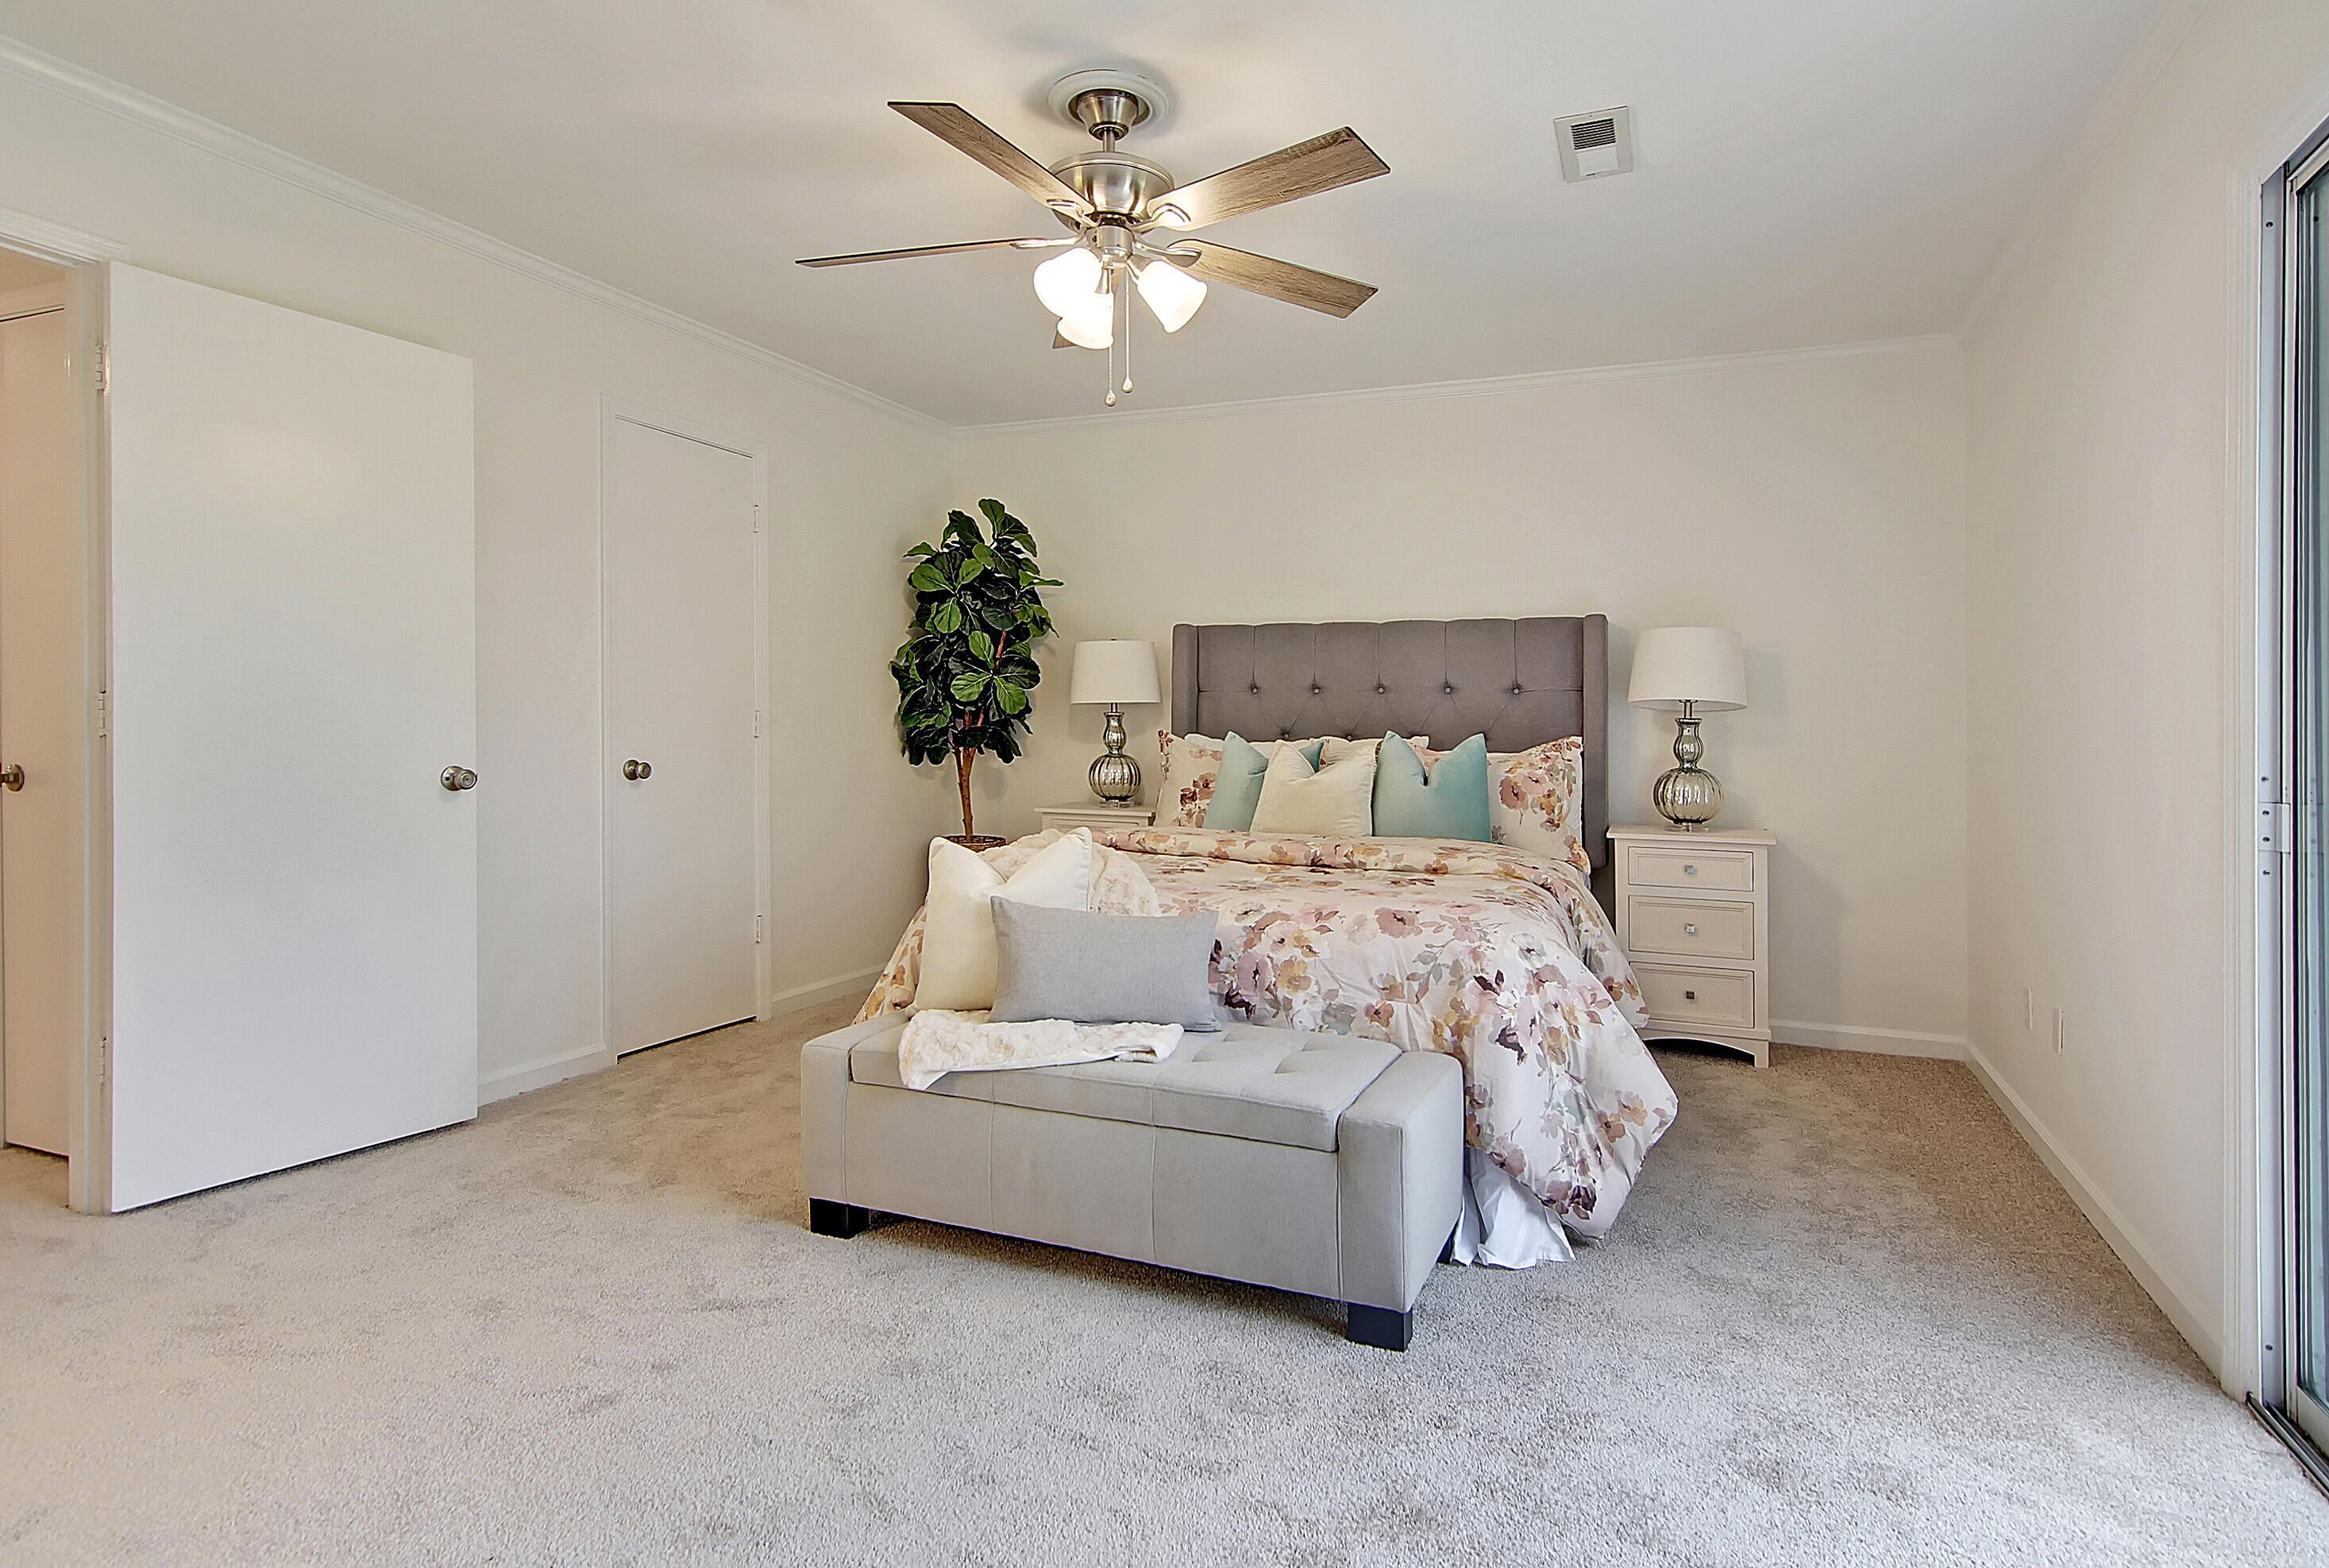 Snee Farm Homes For Sale - 505 Ventura, Mount Pleasant, SC - 9